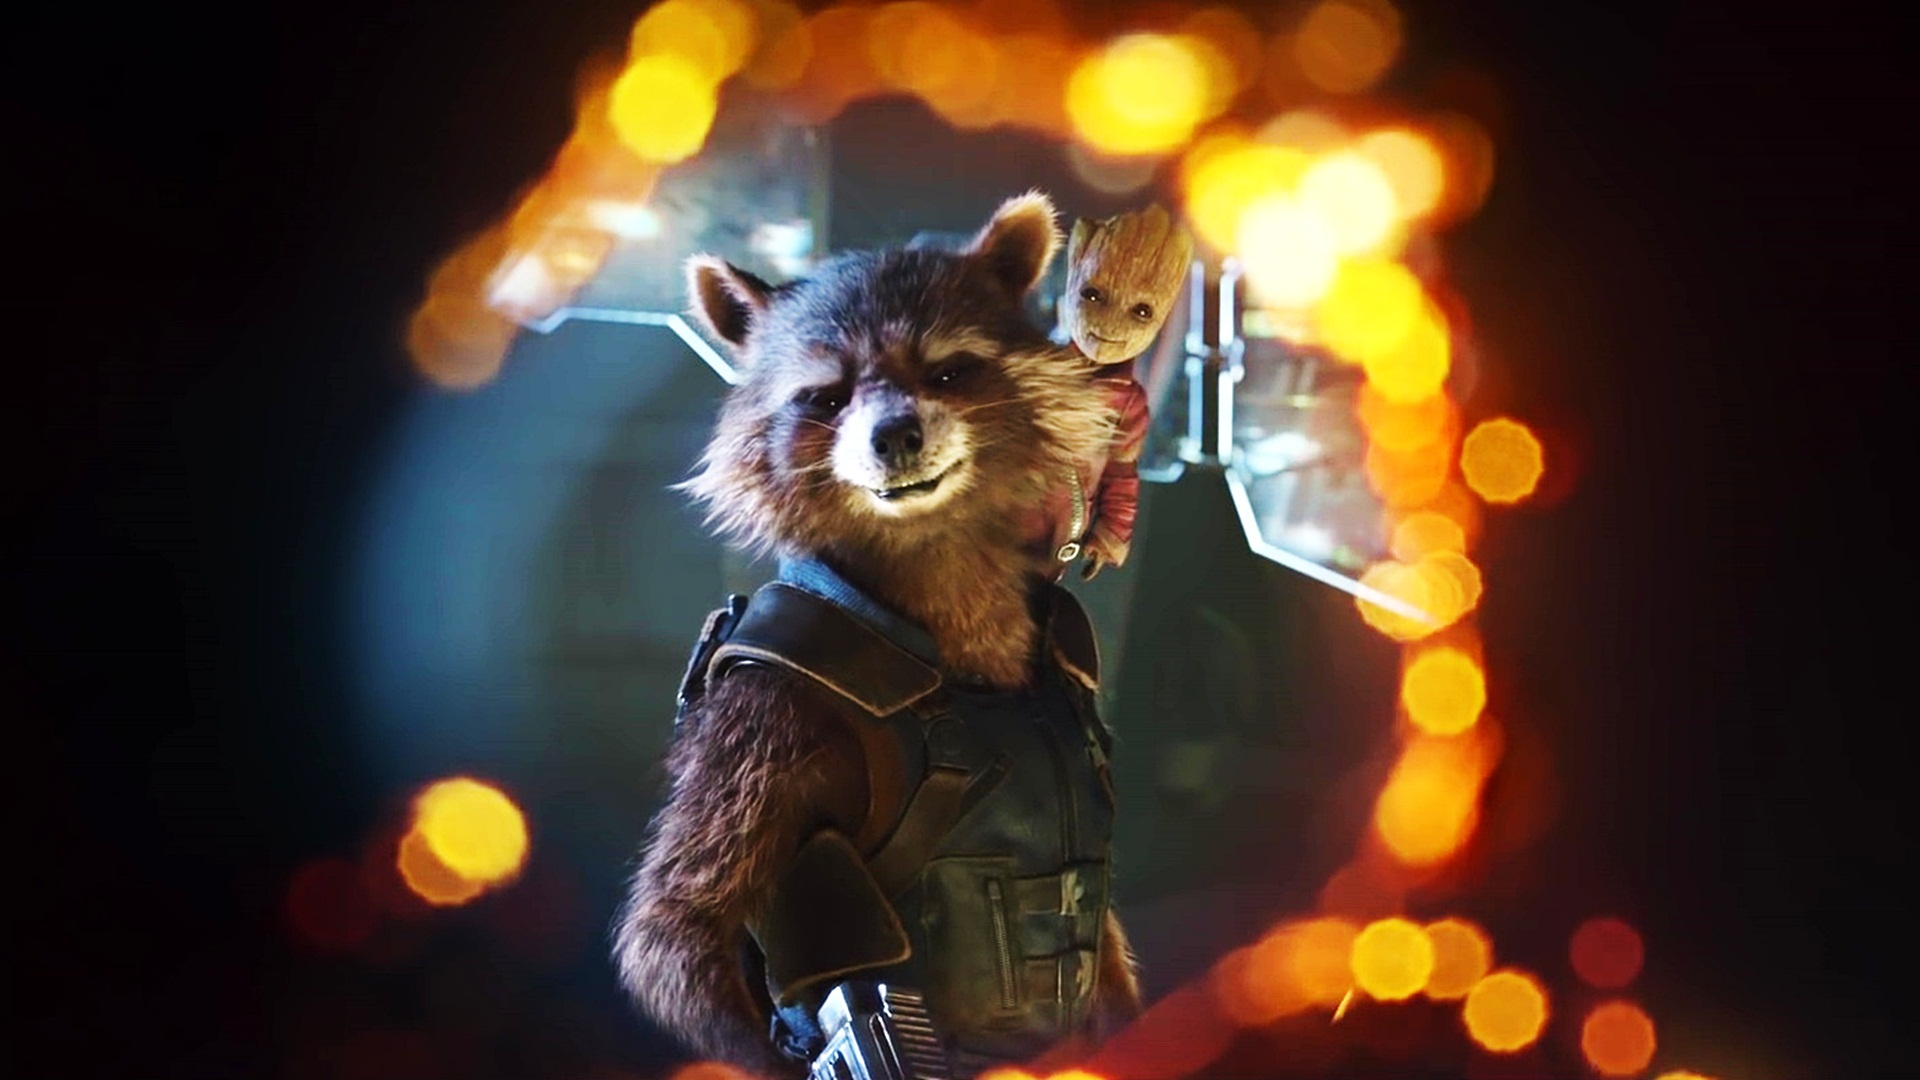 Guardians Of The Galaxy 2 Raccoon   1920x1080 Wallpaper   teahubio 1920x1080